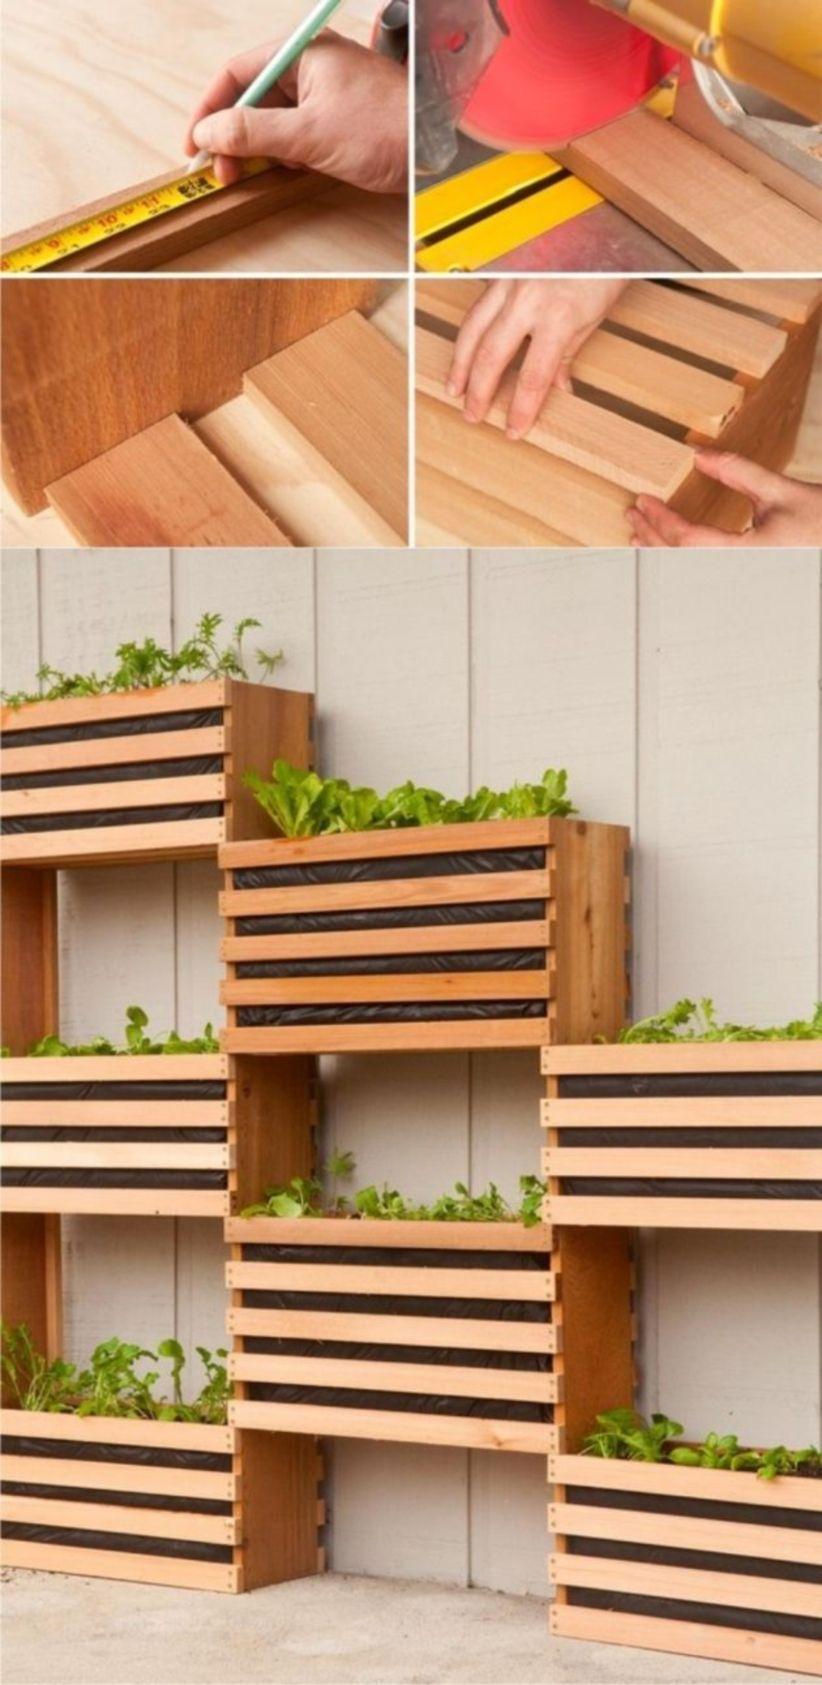 Best DIY Ideas to Make Gardening More Easier 12 | Vertical ...